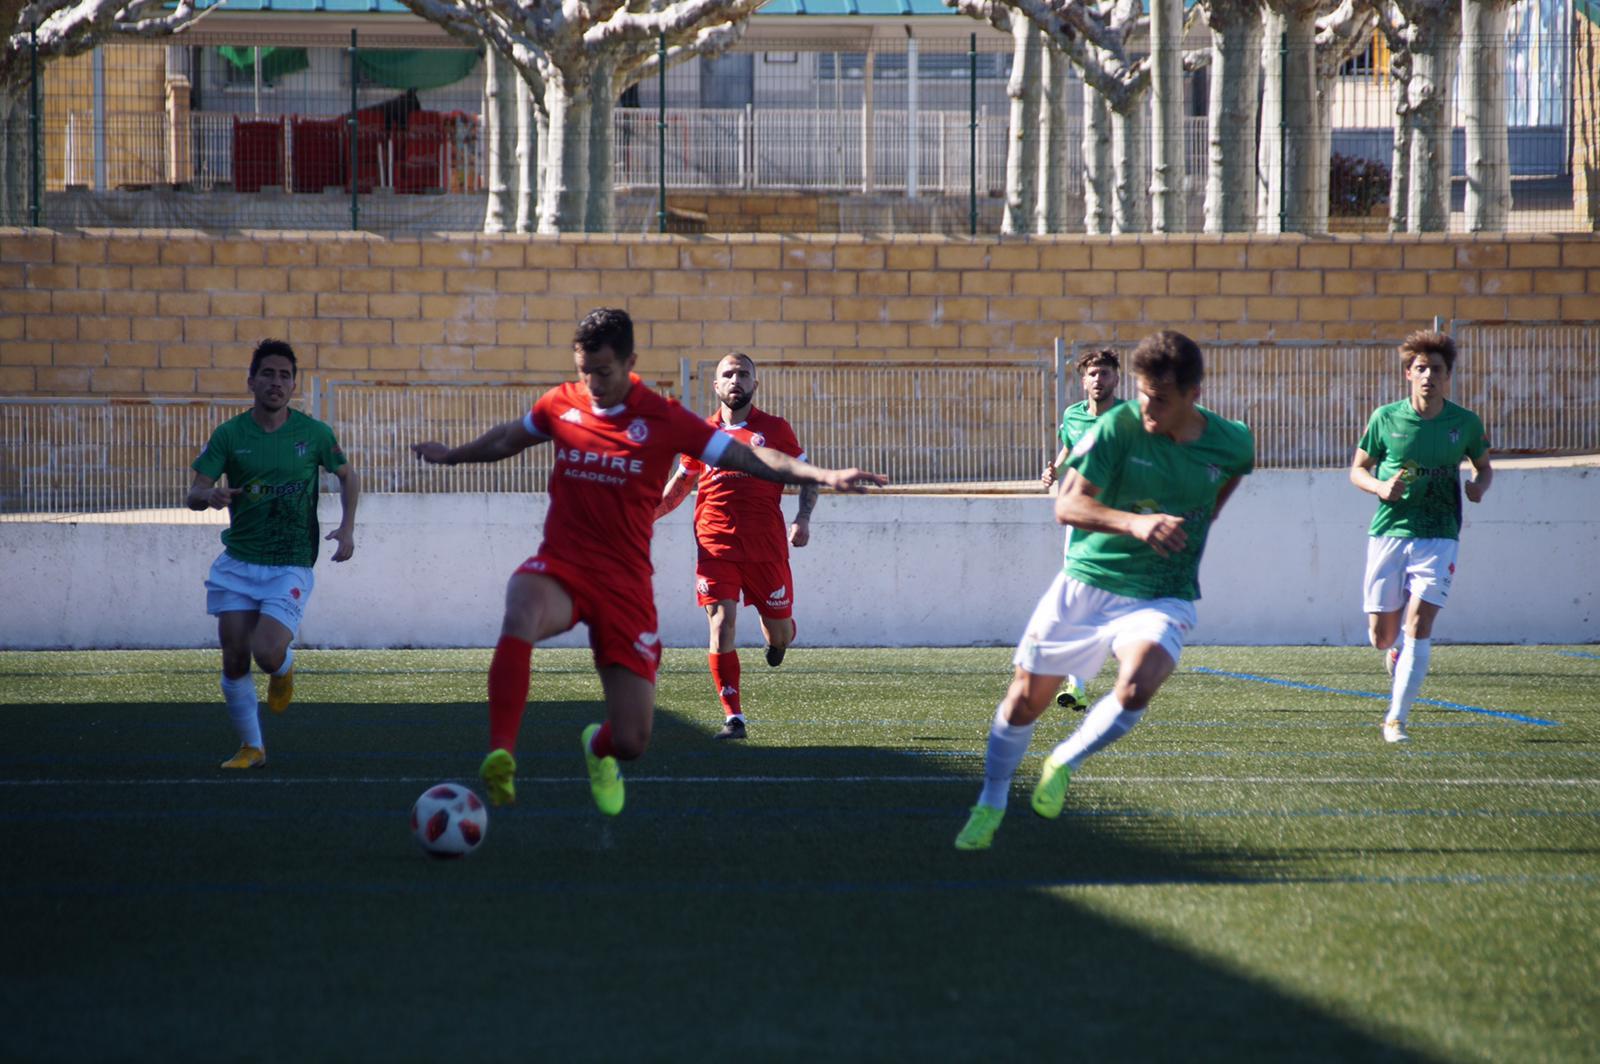 Derrota de la Cultural en Guijuelo (1-0)